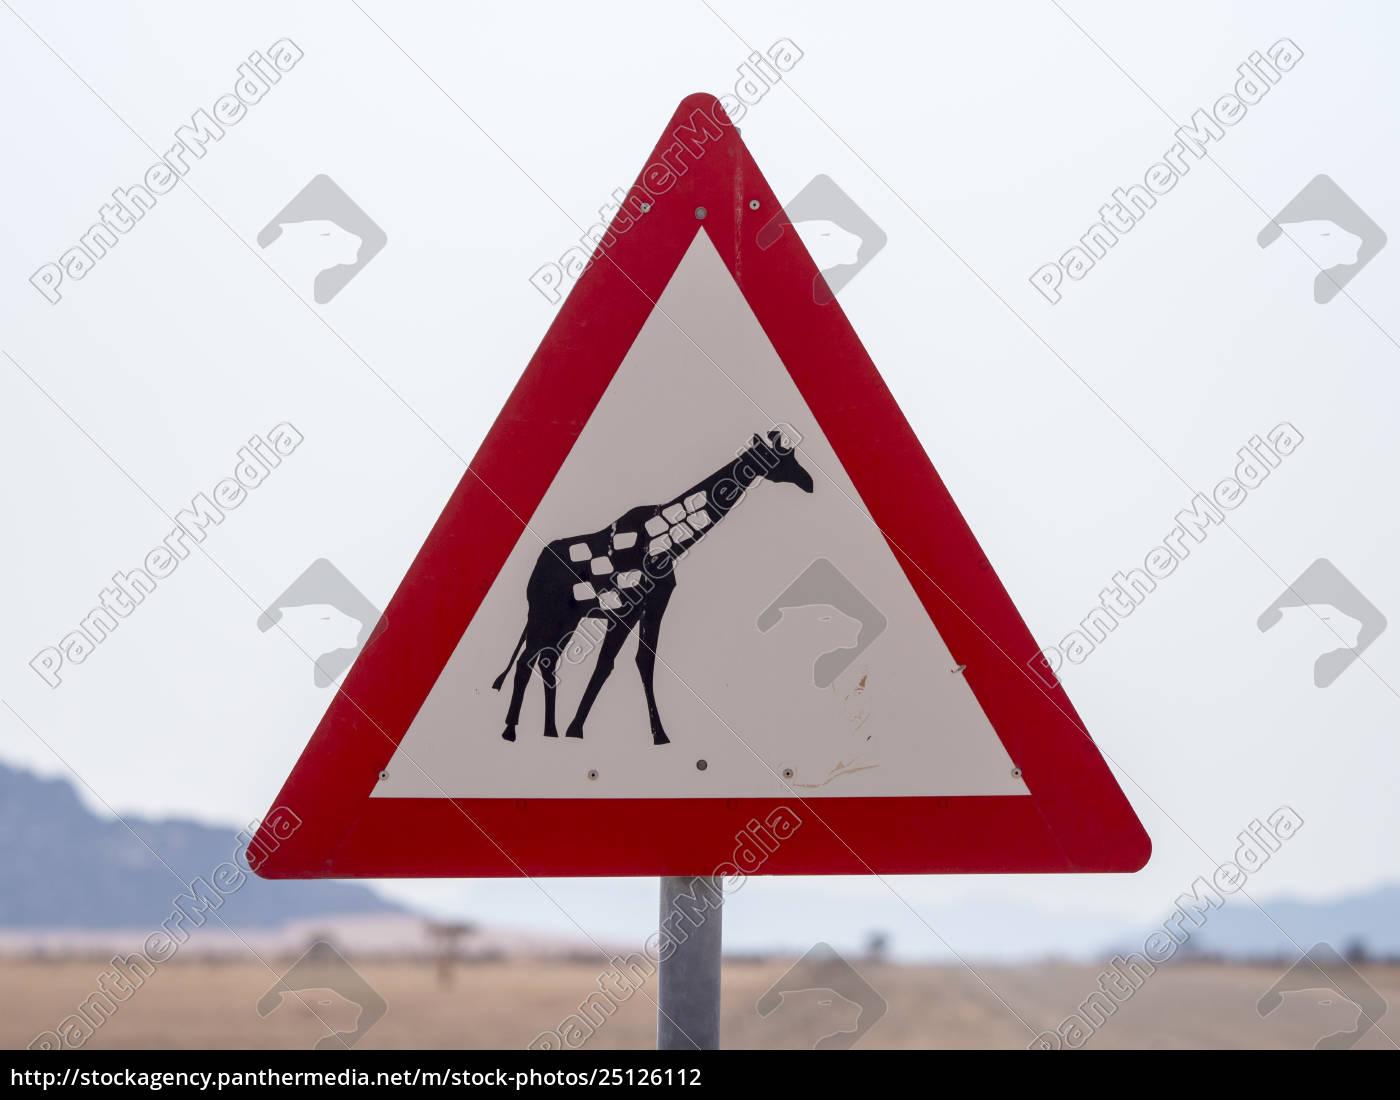 afrika, namibia, verkehrsschild, vorsicht, etikett, giraffe - 25126112